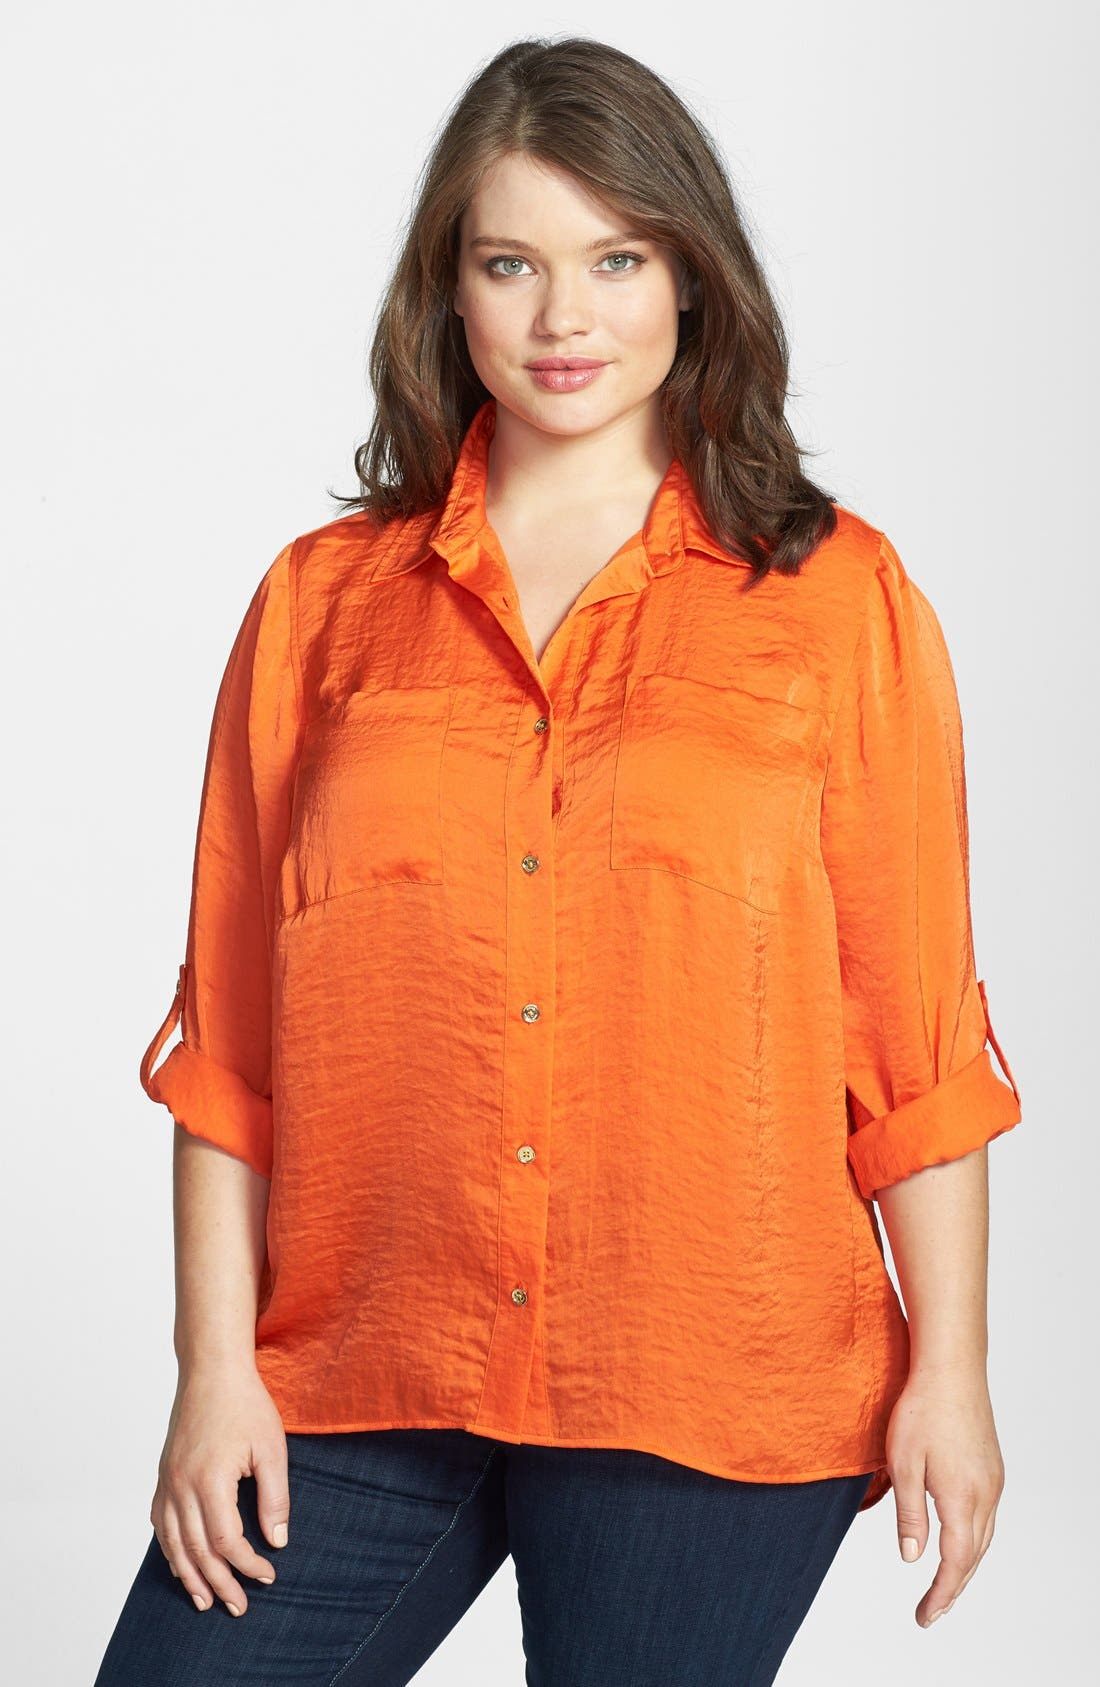 Alternate Image 1 Selected - MICHAEL Michael Kors Roll Sleeve Hammered Satin Shirt (Plus Size)